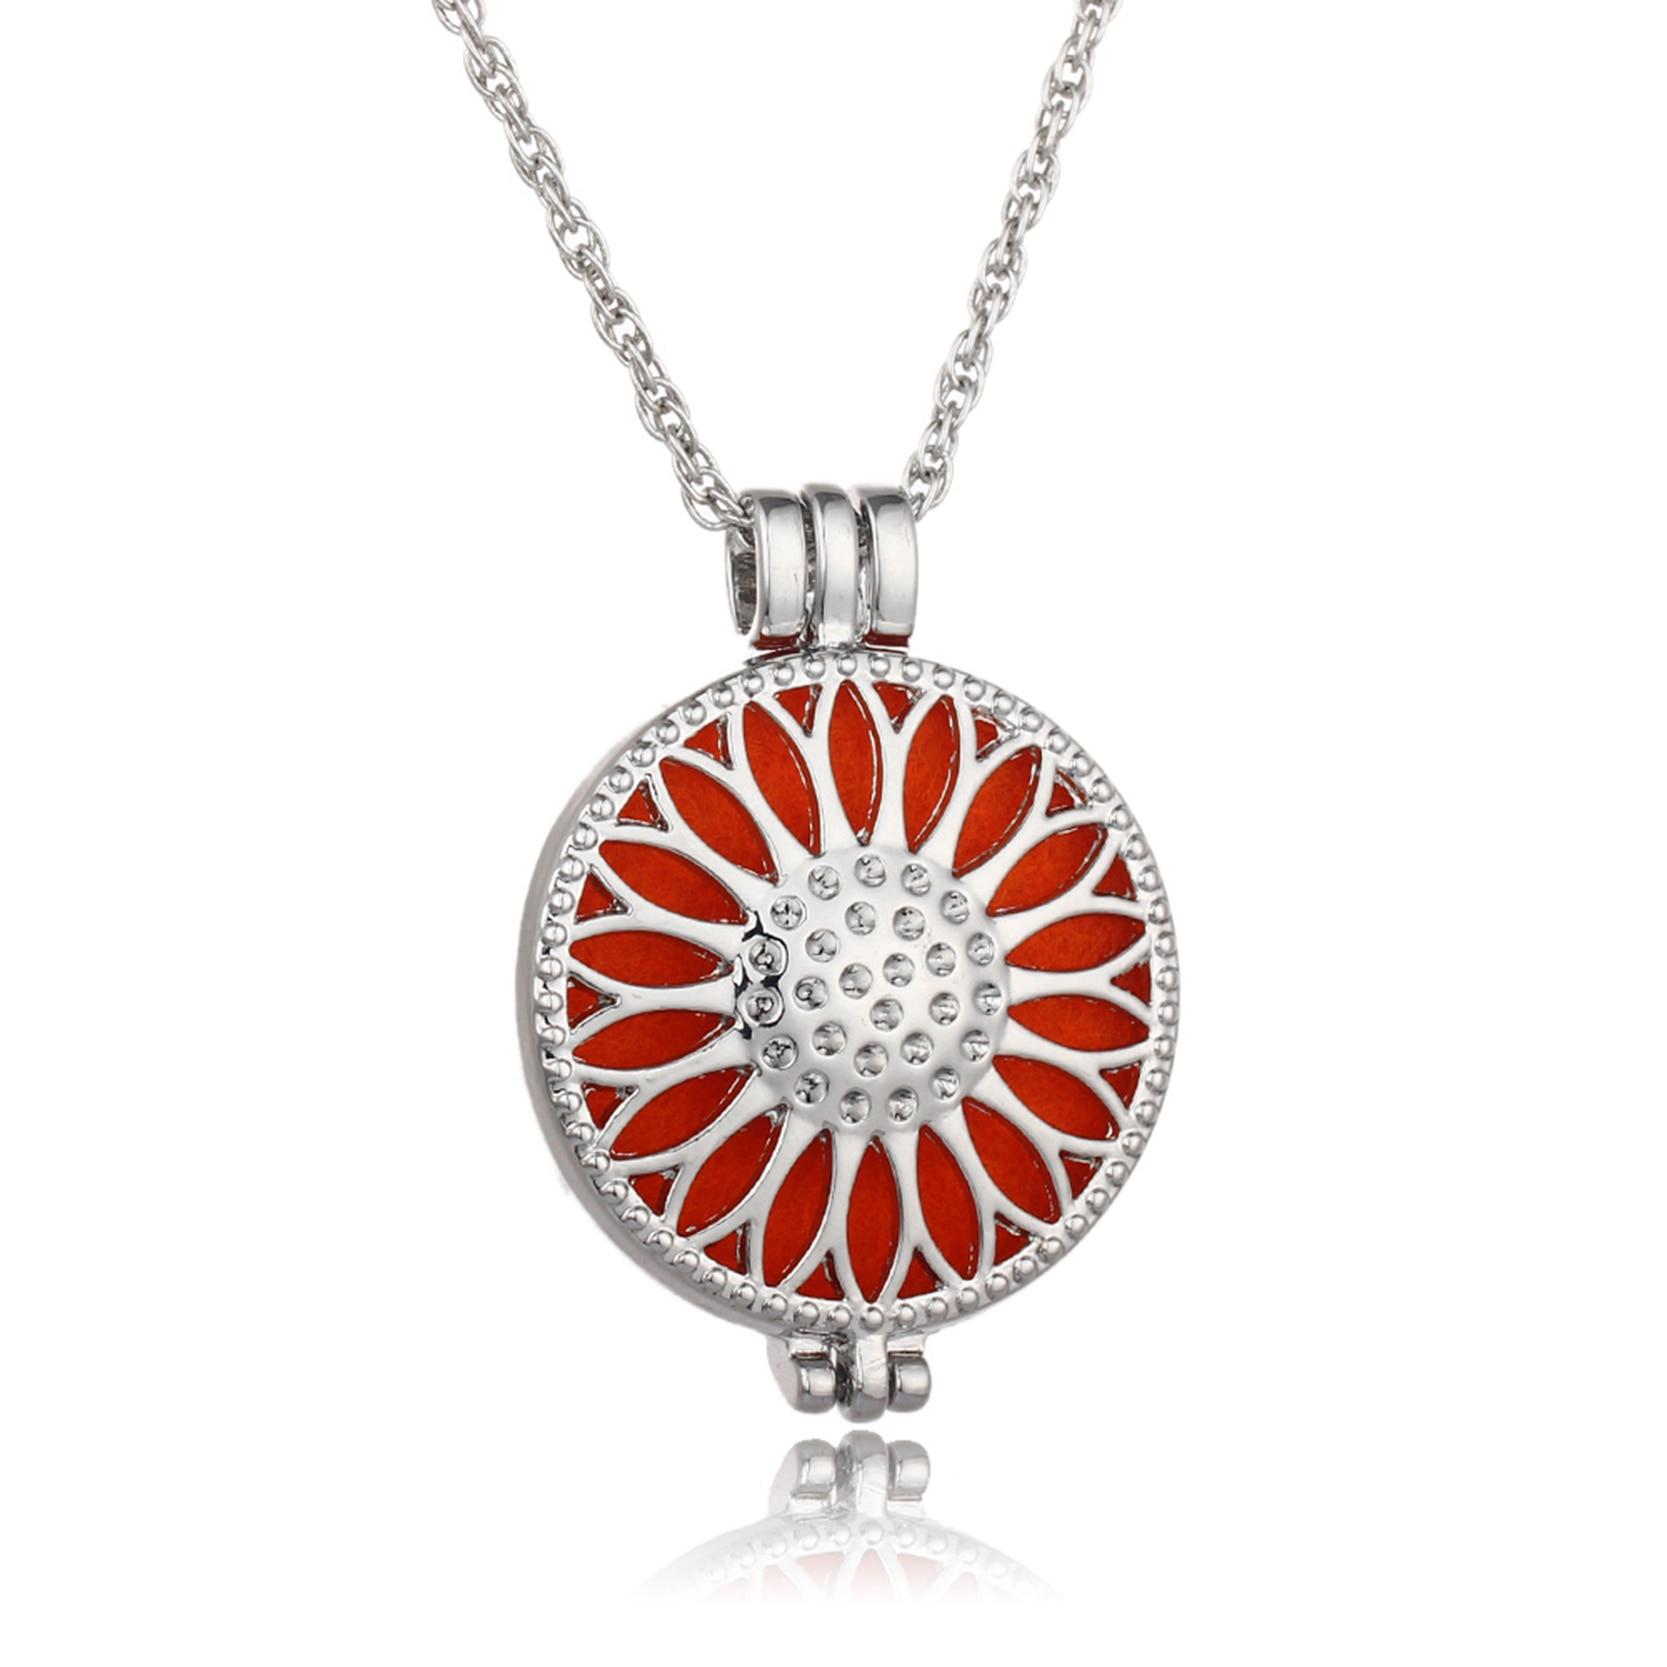 Joyería Vintage bañada en plata con patrón de girasol difusor de aceite aromaterapia colgante collar para mujer (5 almohadillas)